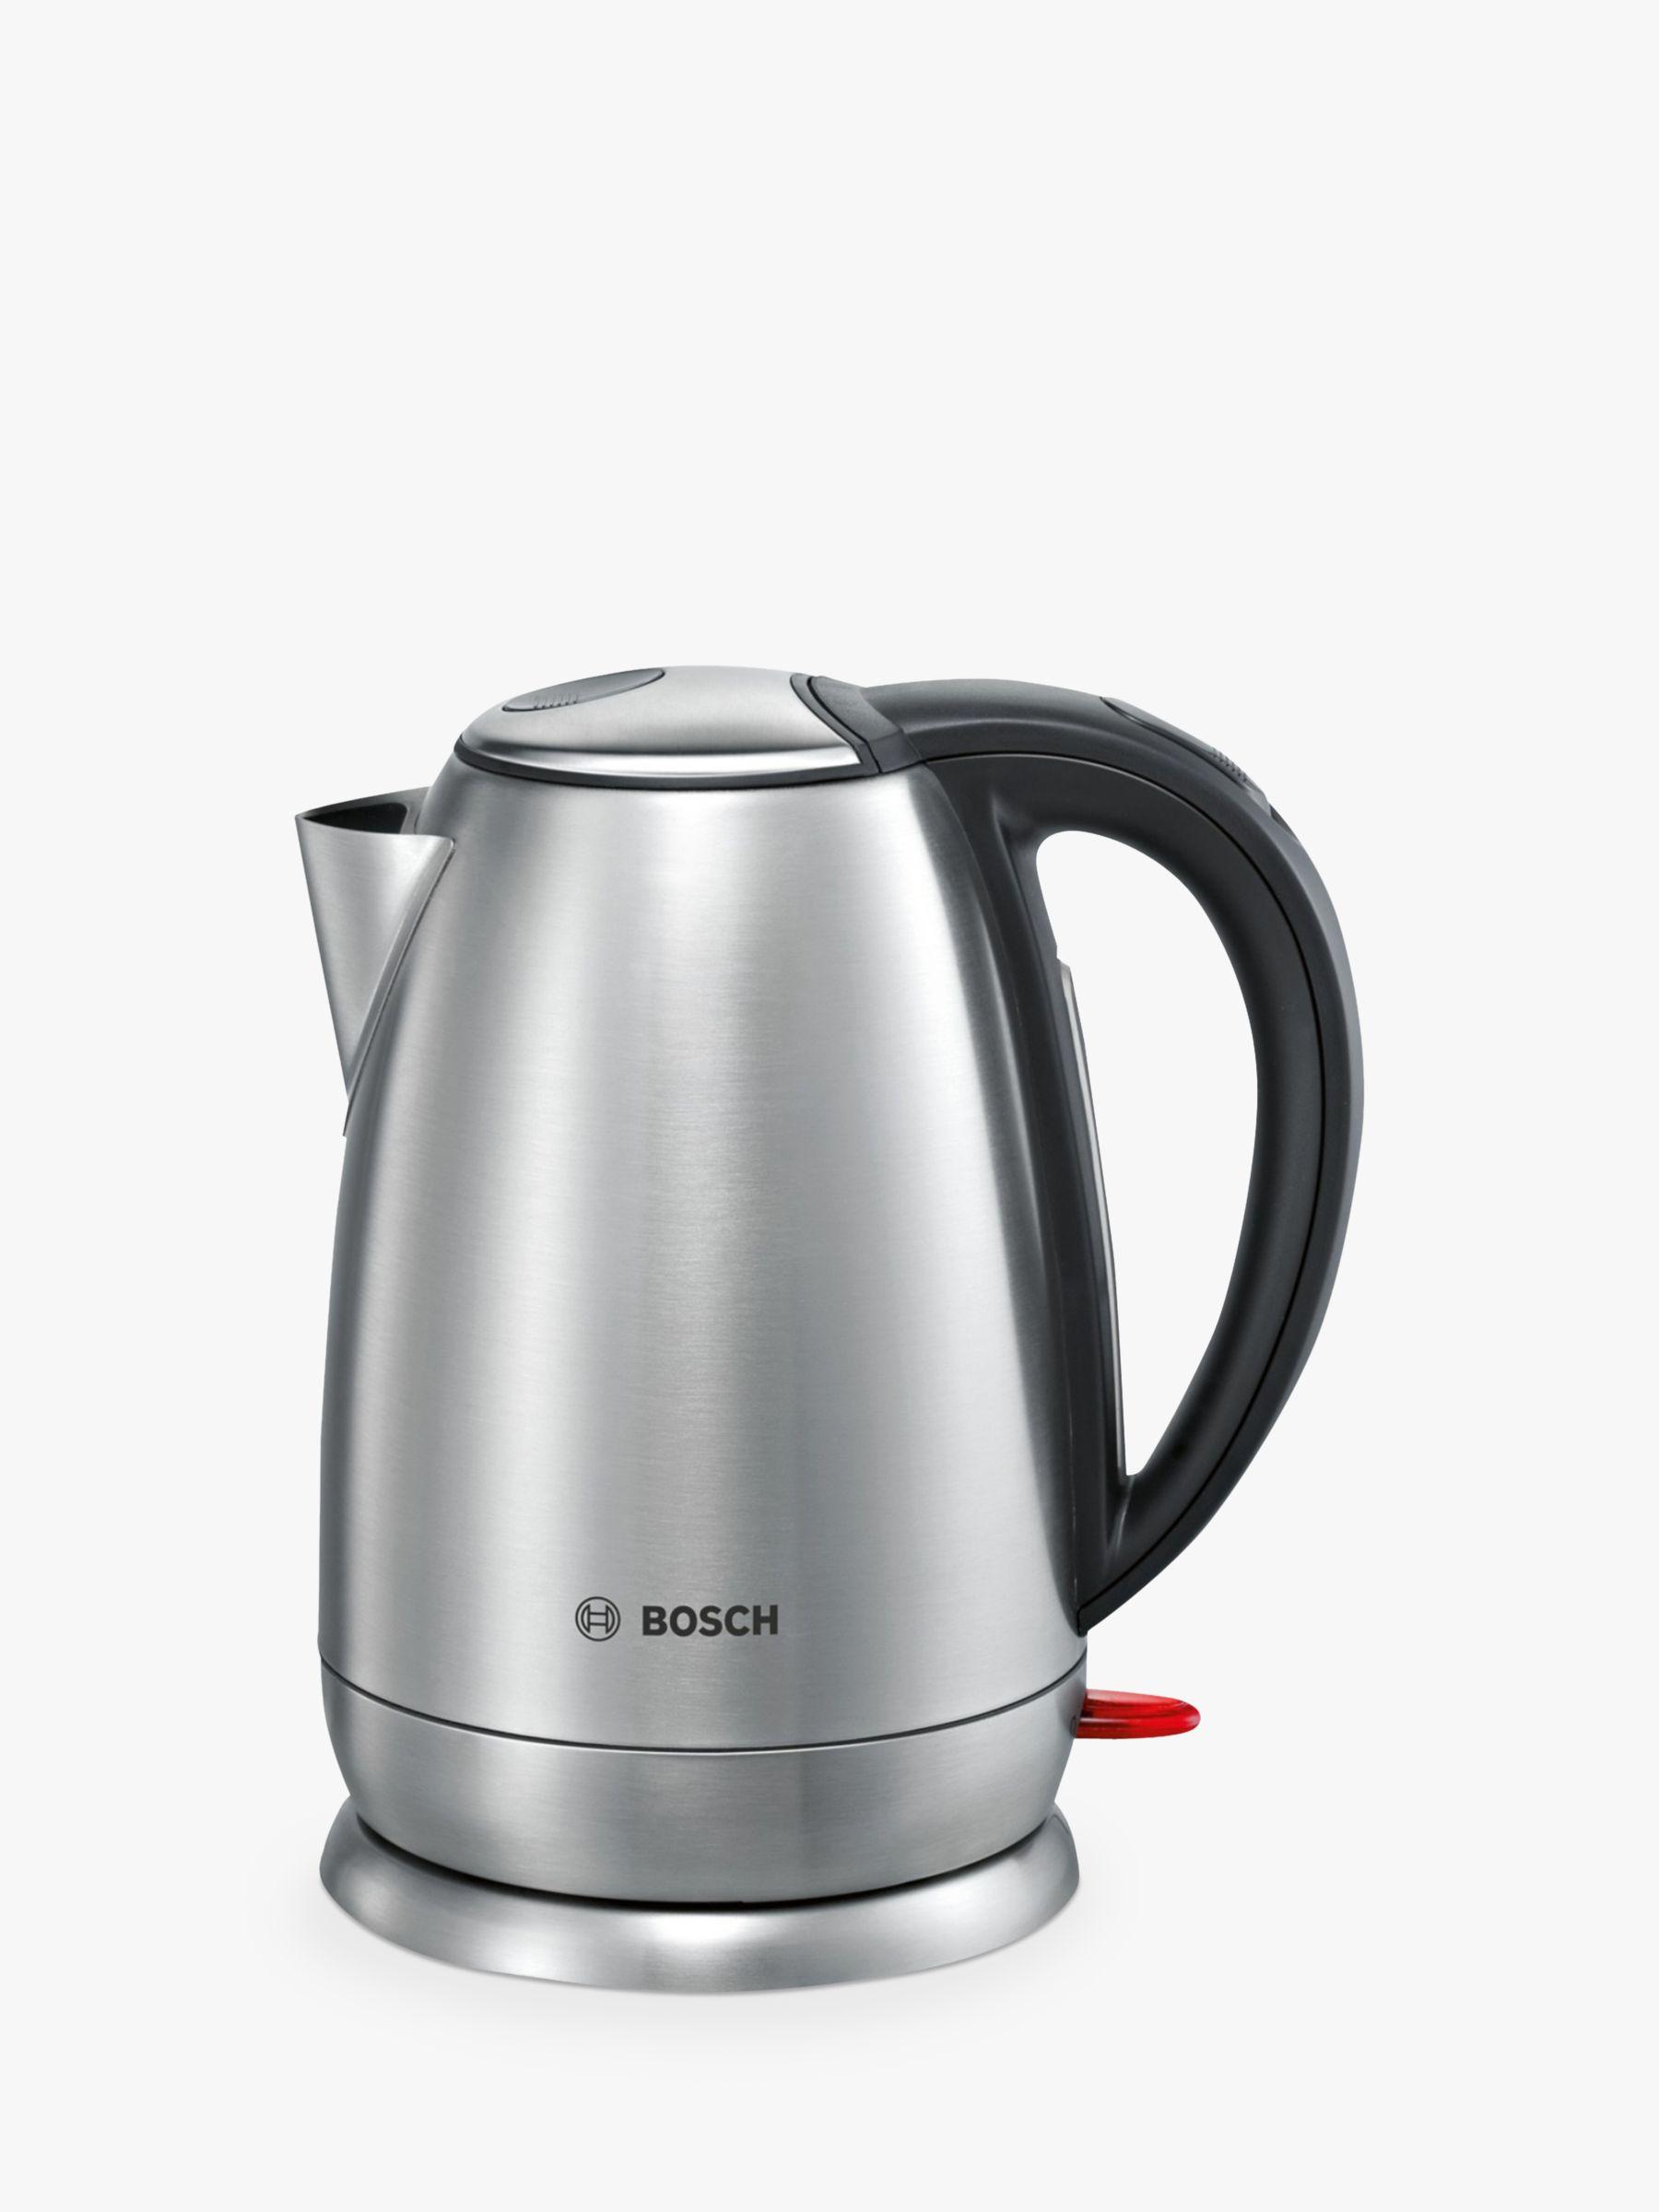 Stainless Steel Kettle ~ Bosch town twk a gb stainless steel kettle bluewater